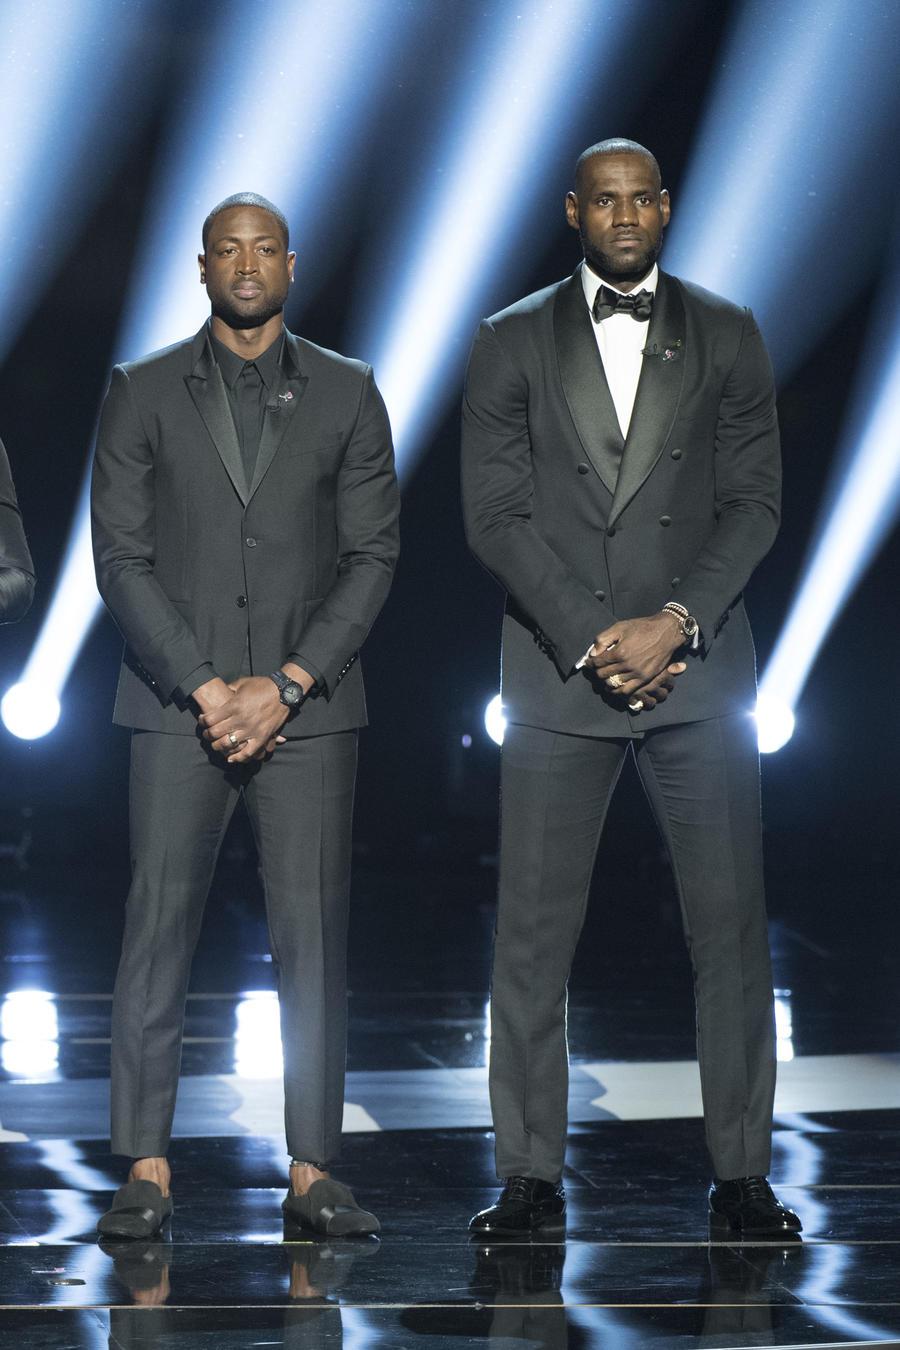 ABC's Coverage of The 2016 ESPYS: LeBron James, Carmelo Anthony, Chris Paul y Dwyane Wade